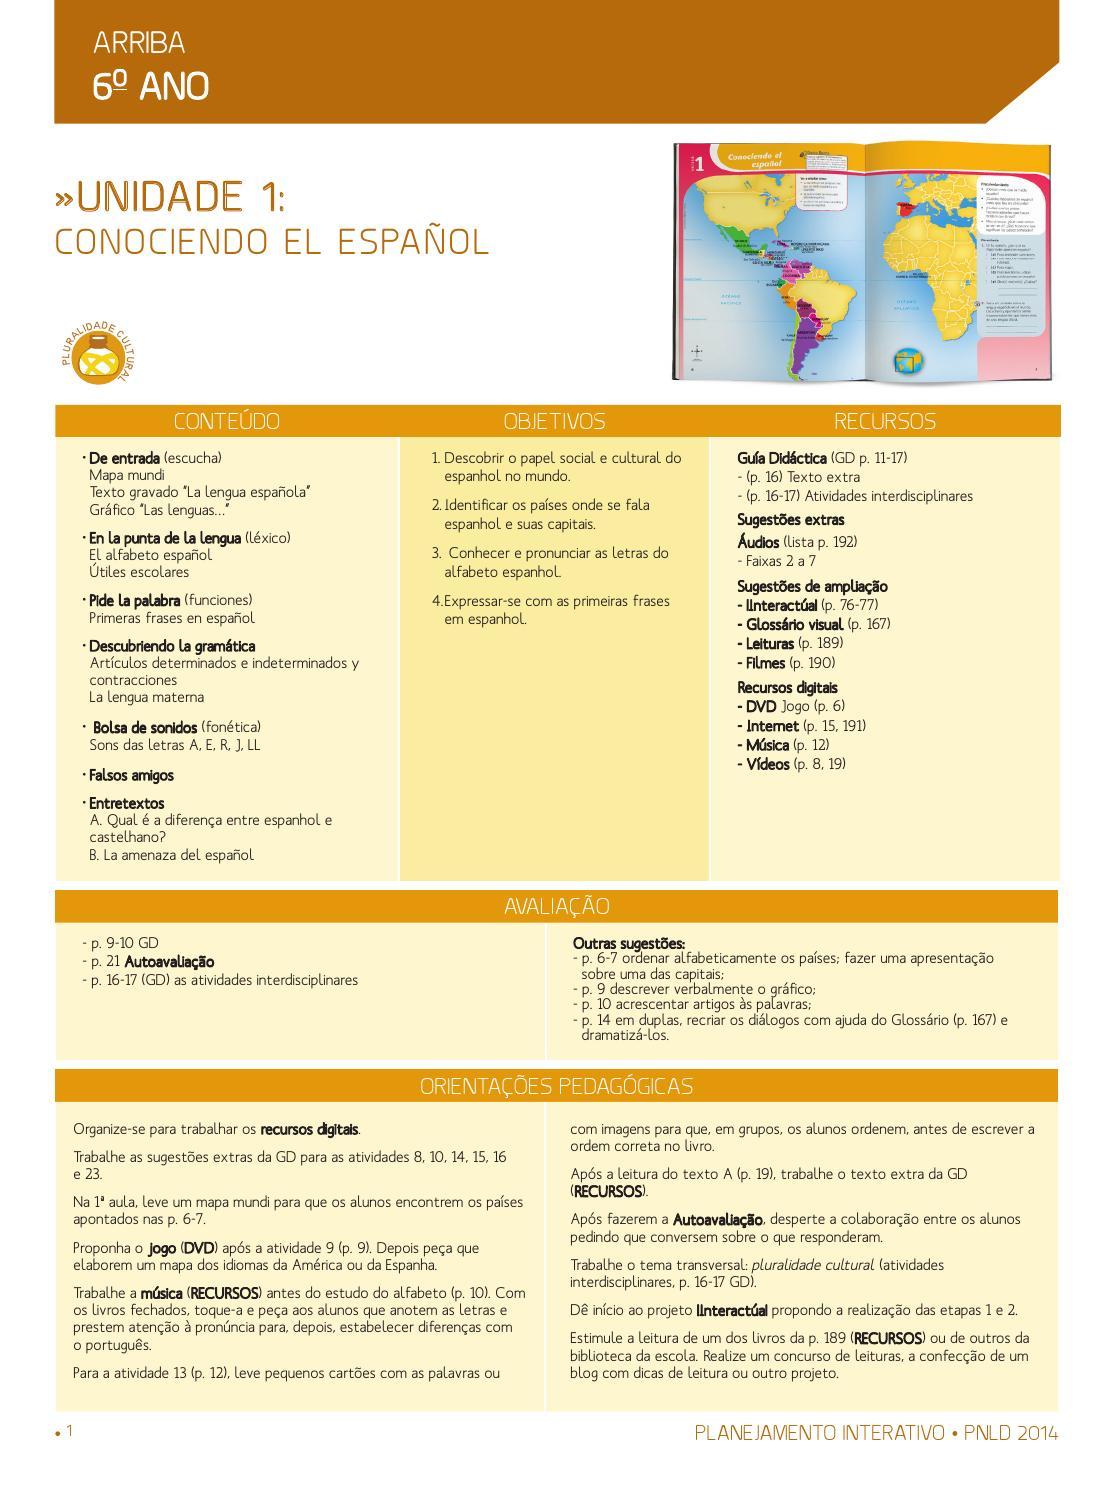 Planejamento Arriba Pnld By Thiago Jordano Issuu